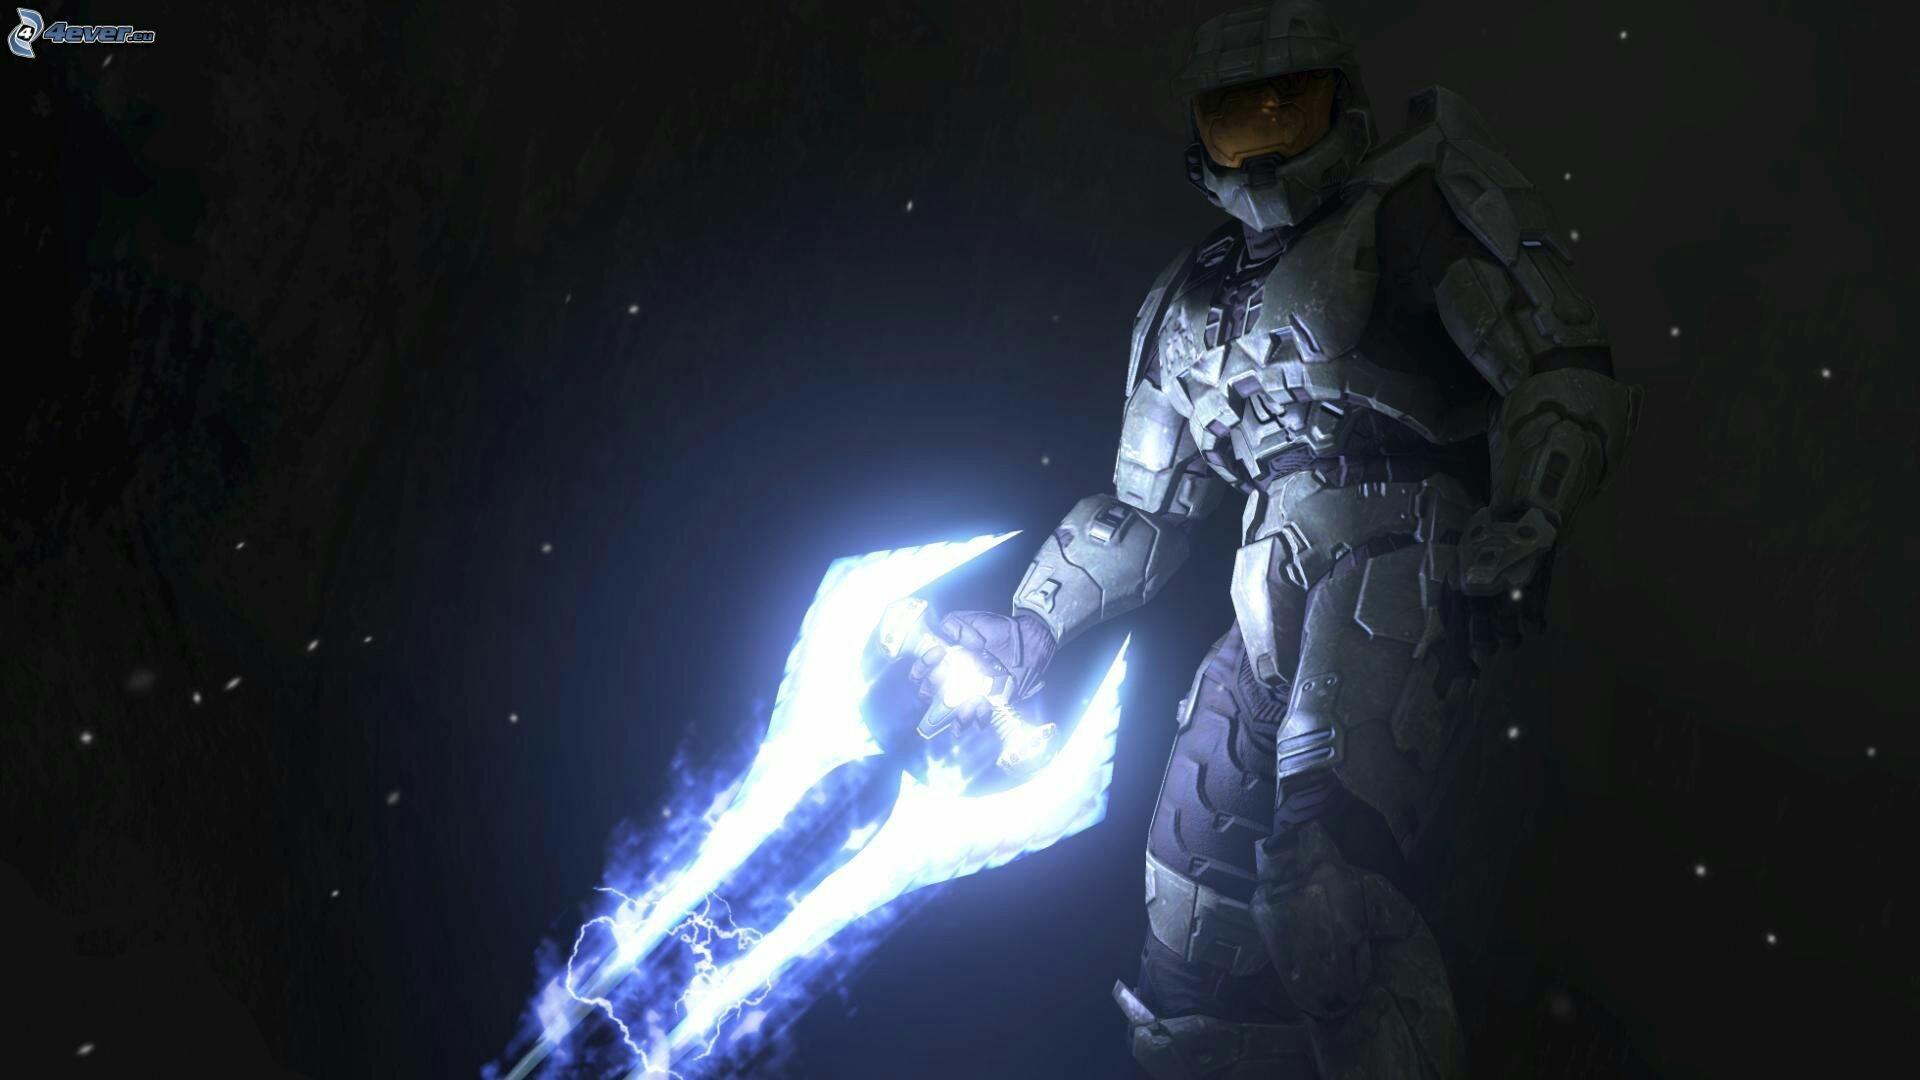 Explore Halo Master Chief, Game Pics, and more!